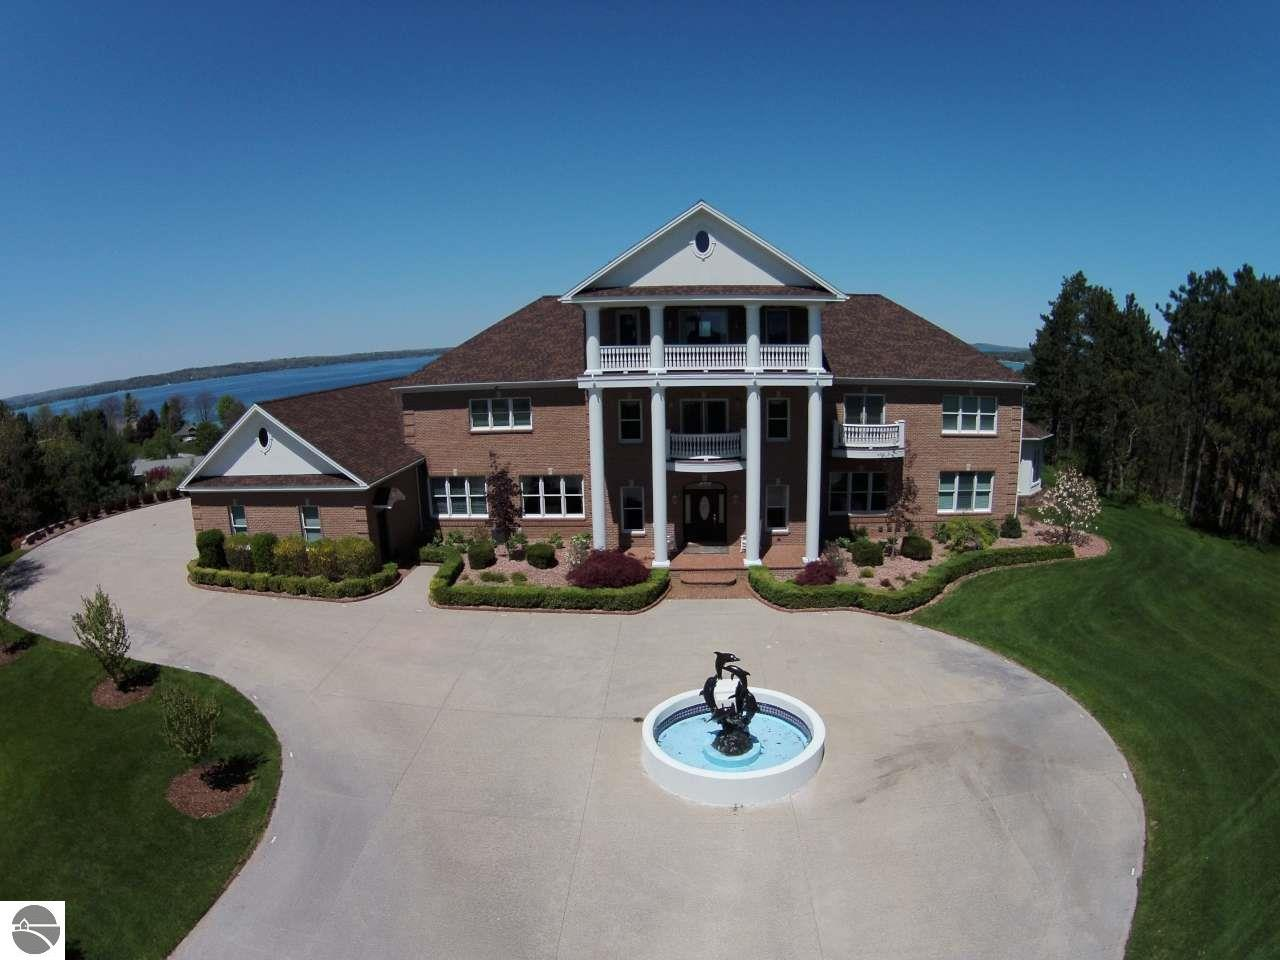 Property for sale at 3399 Sail View Lane, Williamsburg,  MI 49690